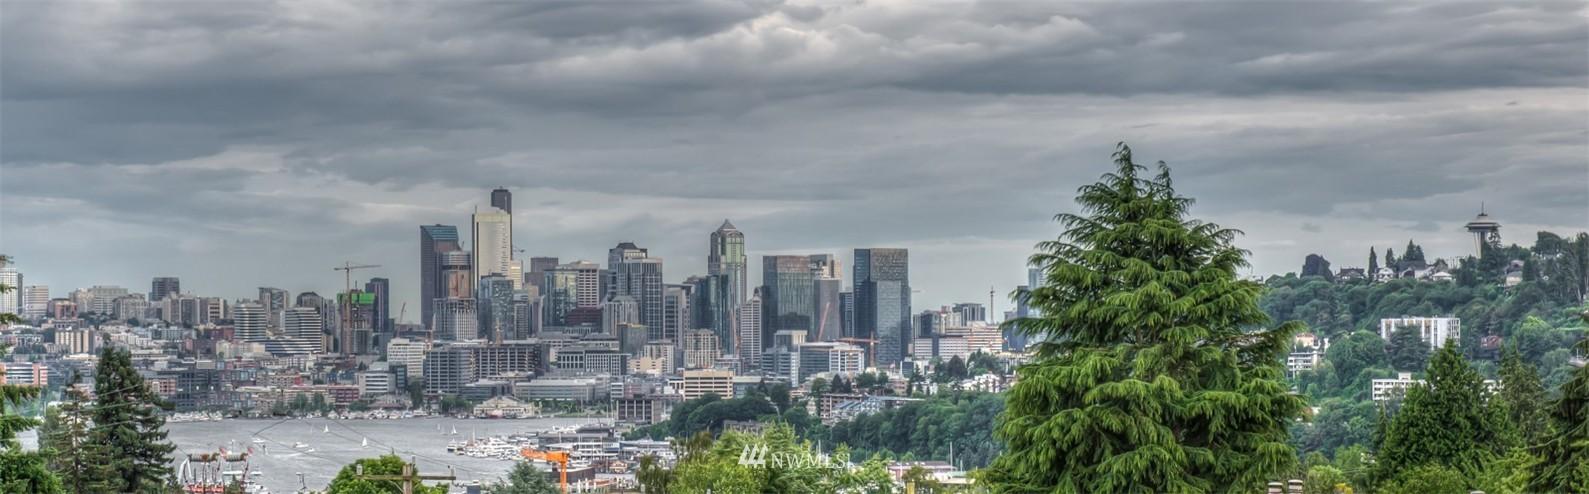 Sold Property | 4323 Woodland Park Avenue N Seattle, WA 98103 12